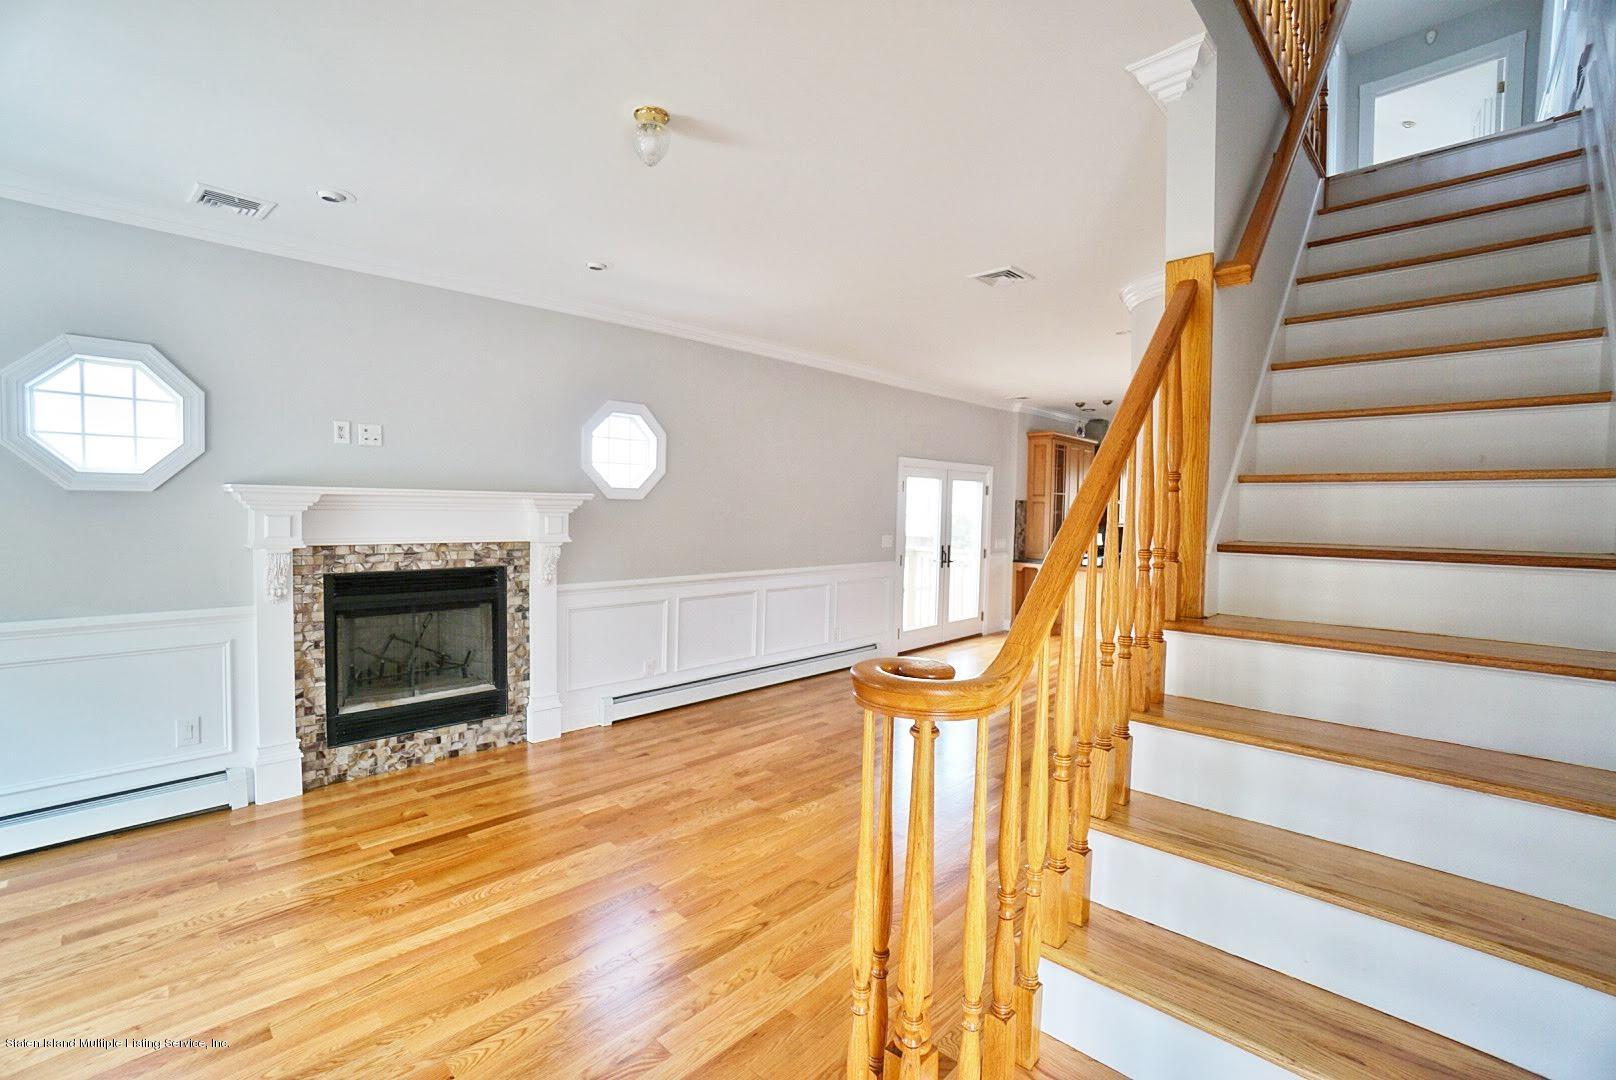 Single Family - Detached 445 Manhattan Street  Staten Island, NY 10307, MLS-1130505-20